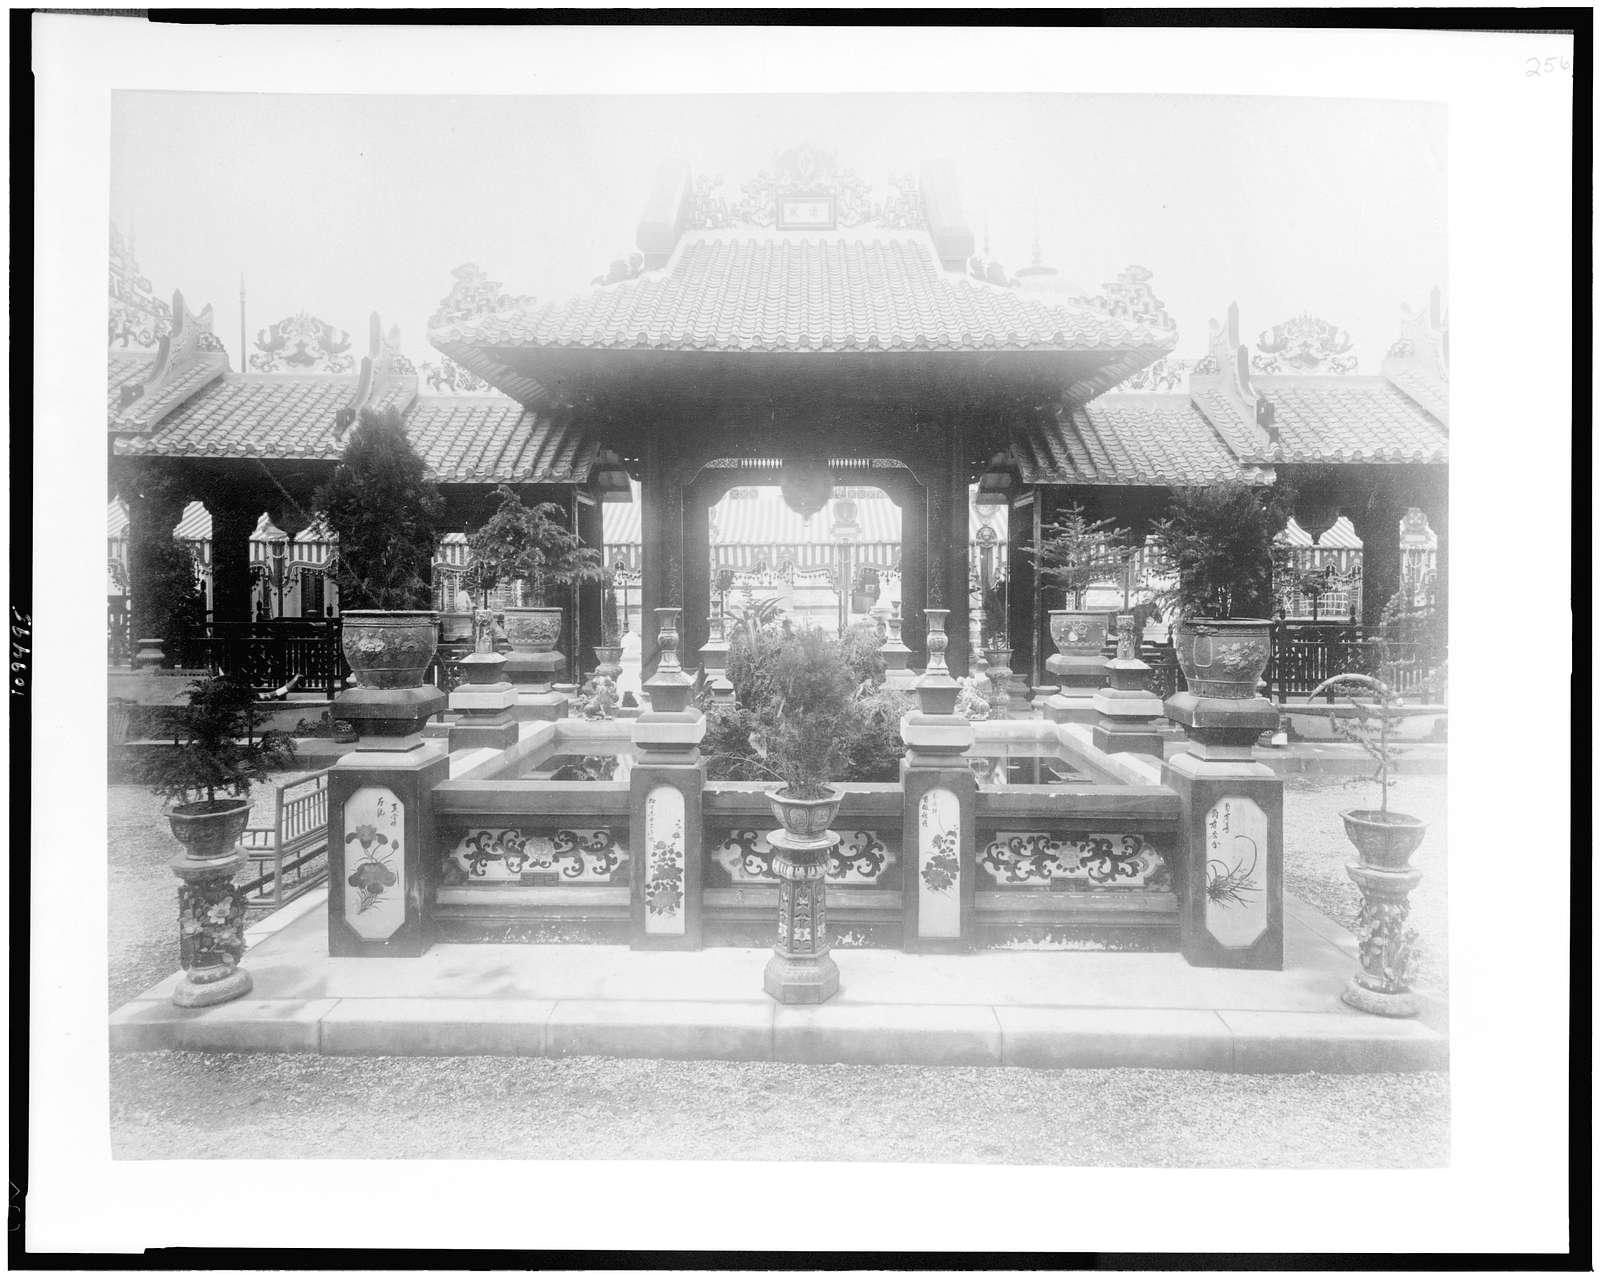 [Pavilion of Cochinchine courtyard, Paris Exposition, 1889]